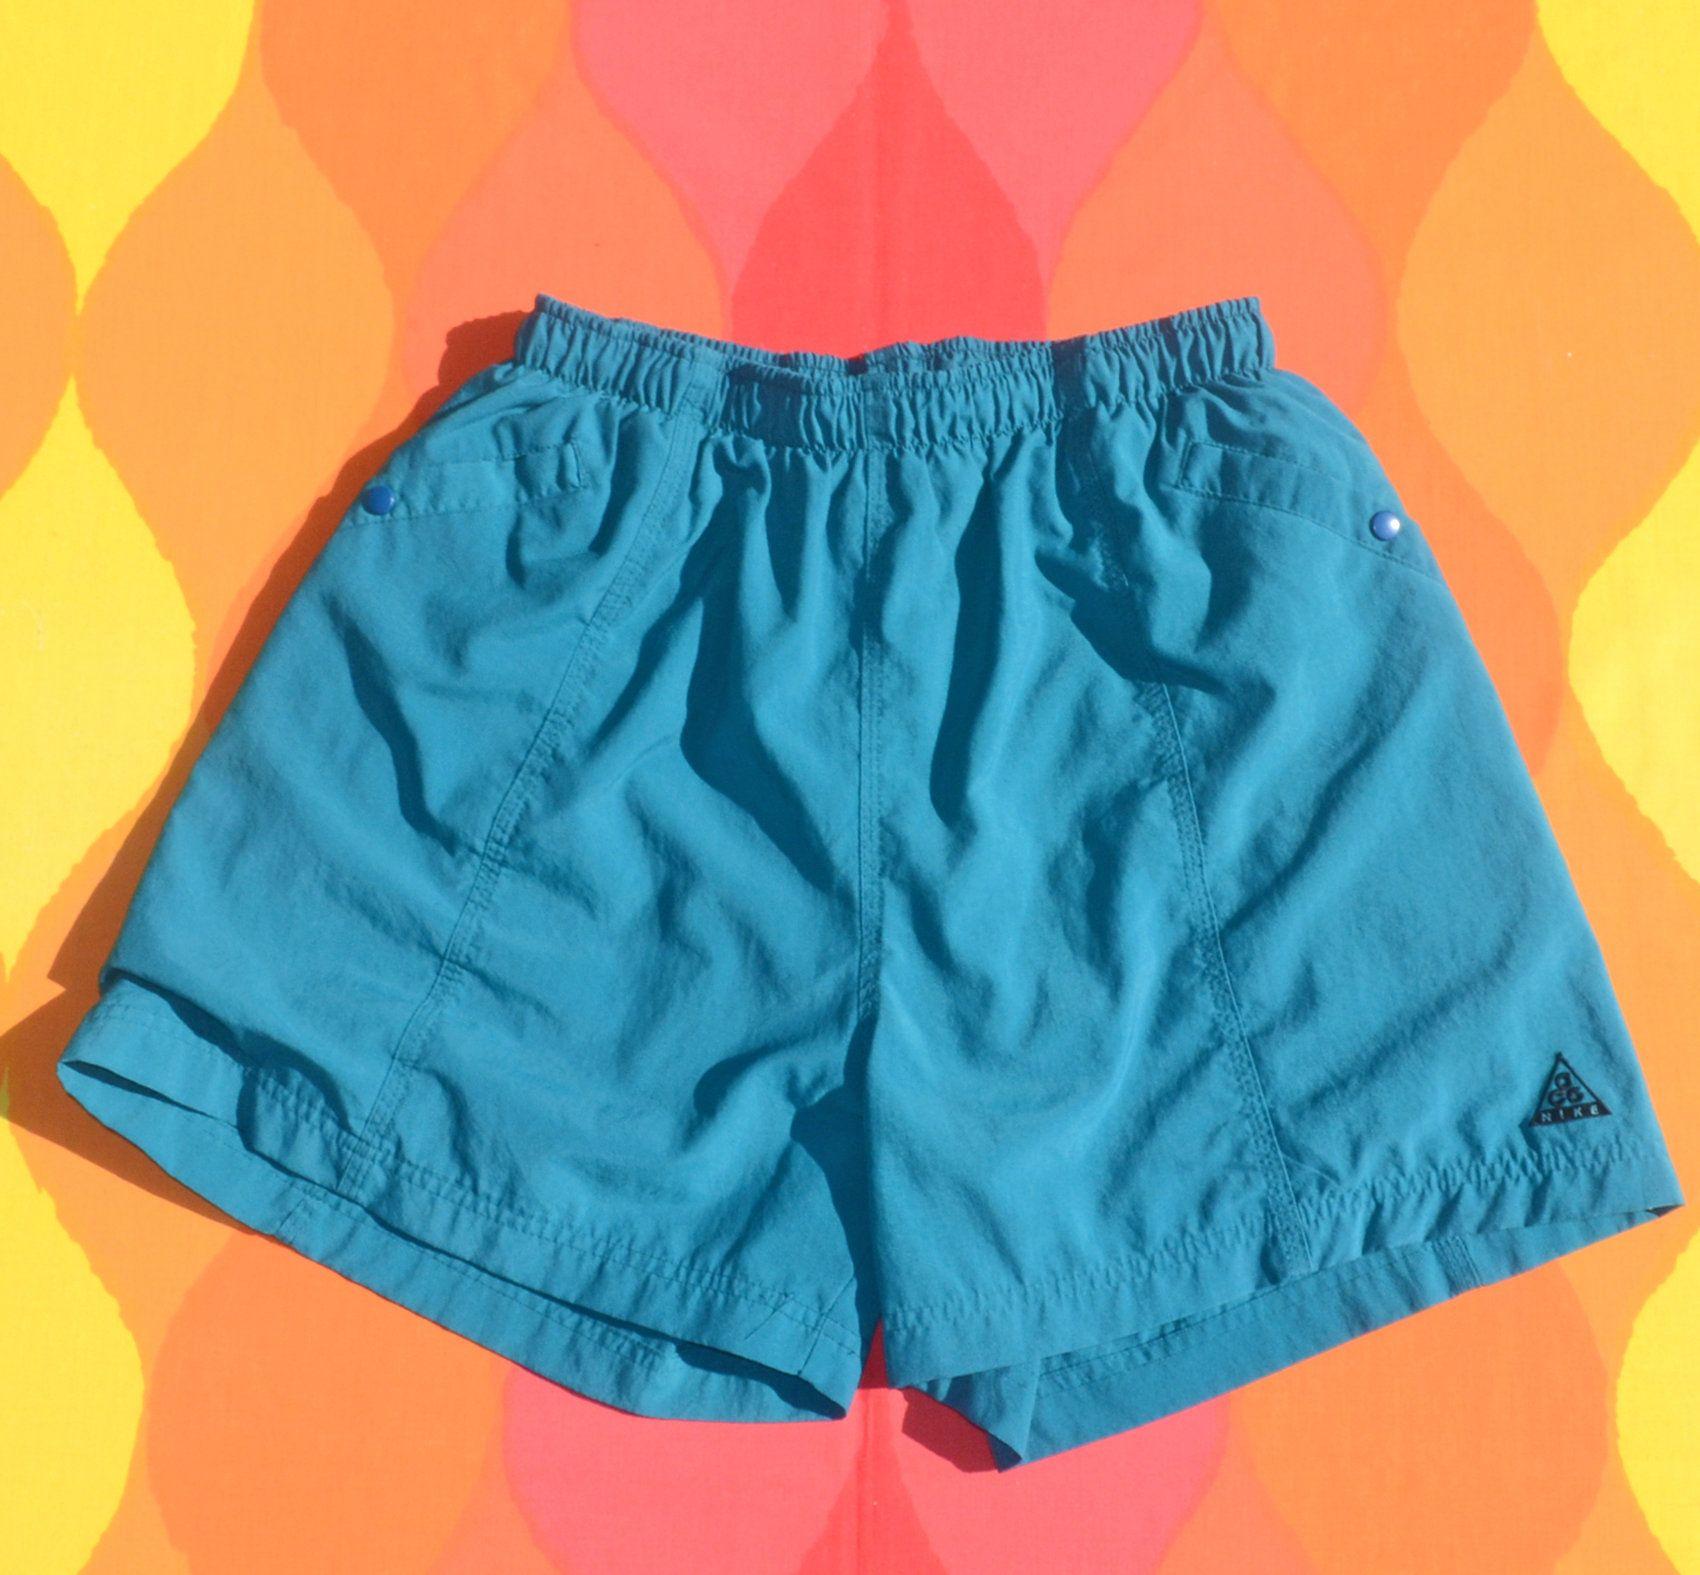 021ba80216ad5 vintage 90s shorts NIKE ACG bathing suit swim trunks lined teal Medium